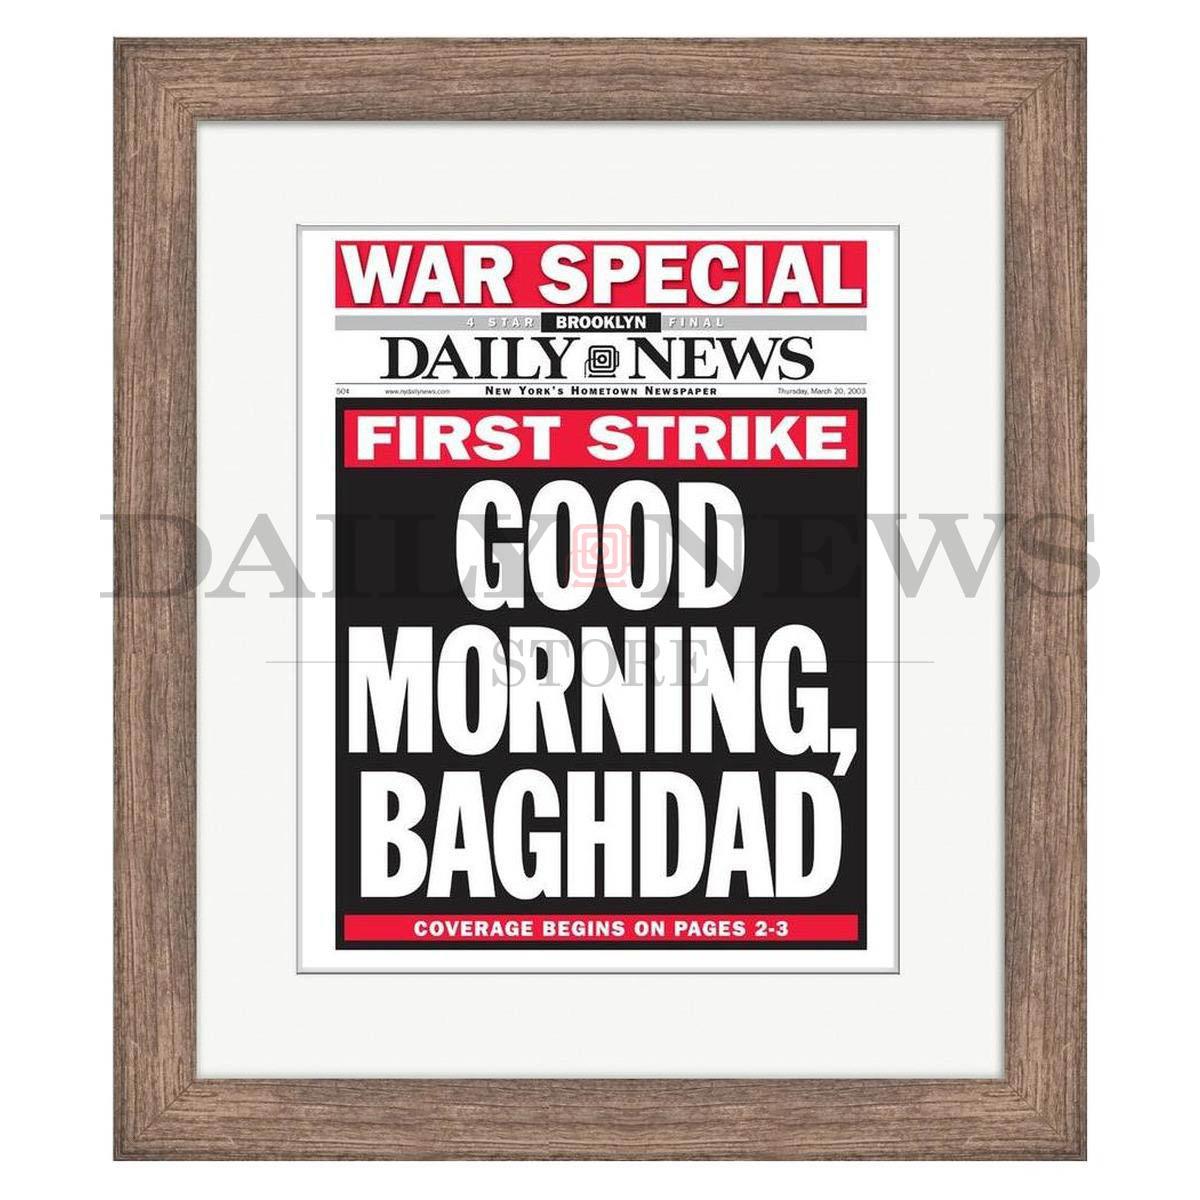 Good Morning, Baghdad - 3/20/2003